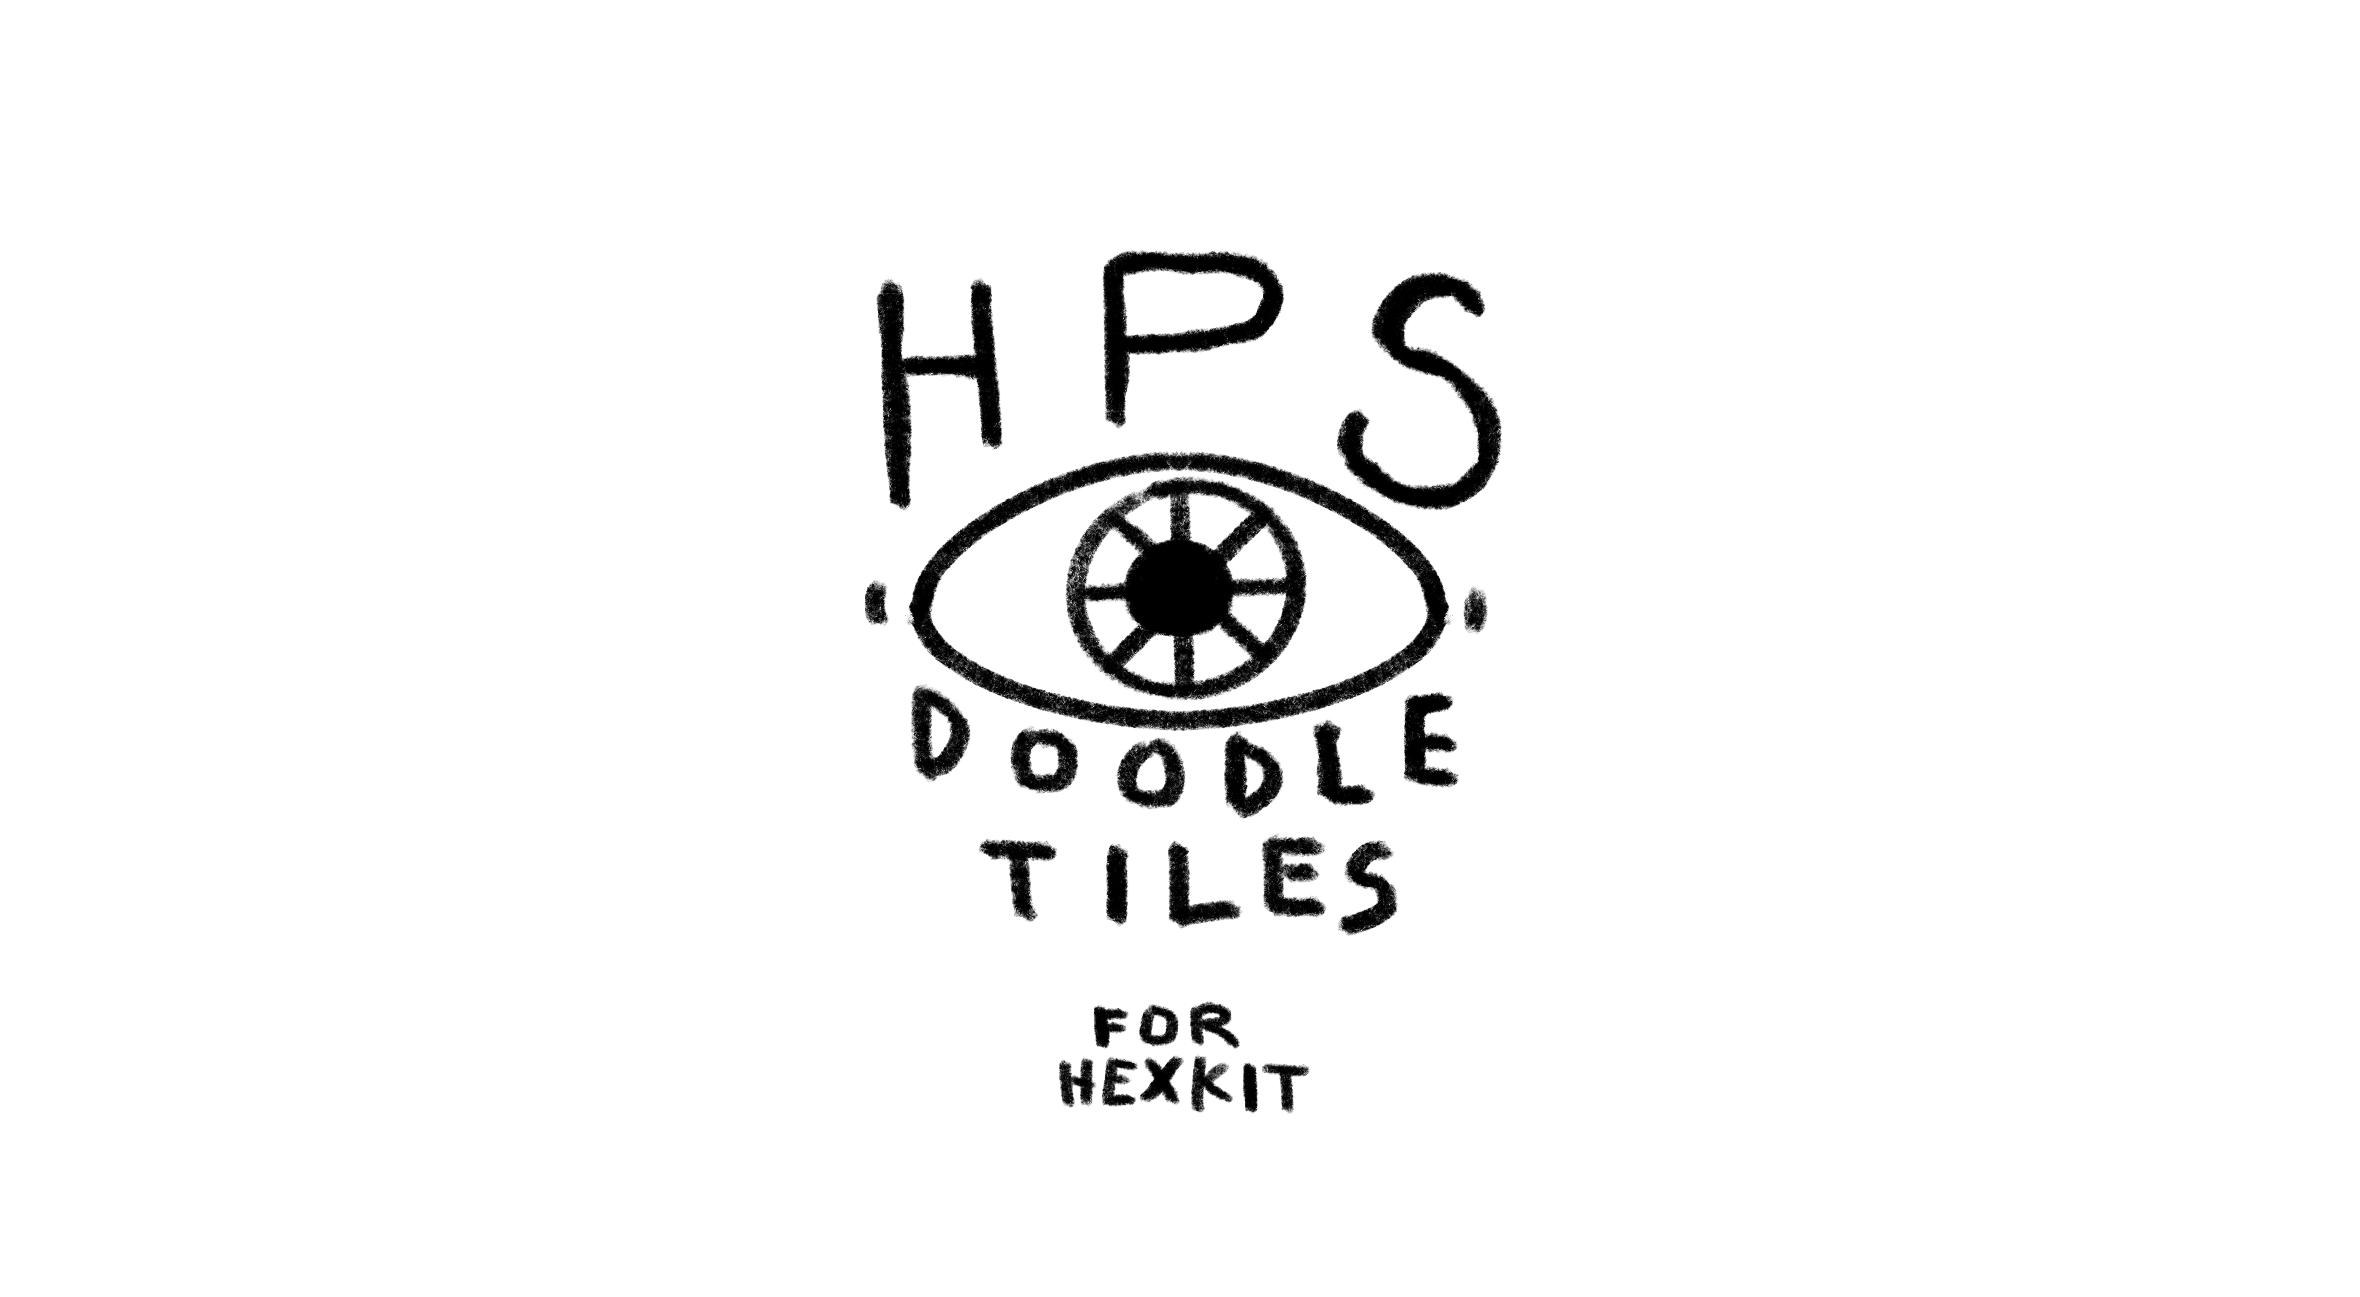 HPS Doodle Tiles